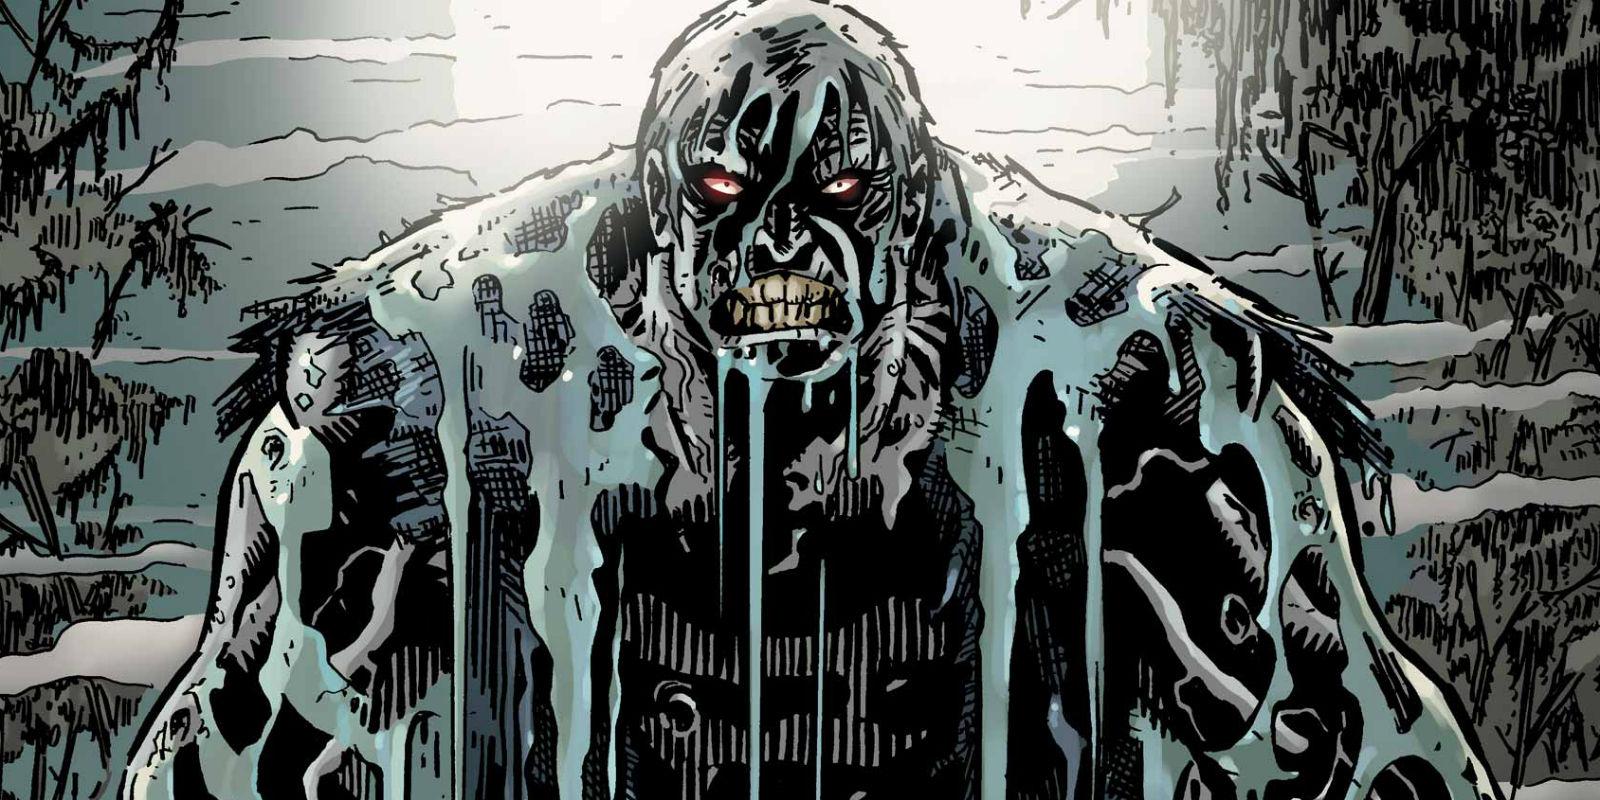 Solomon Grundy from DC Comics